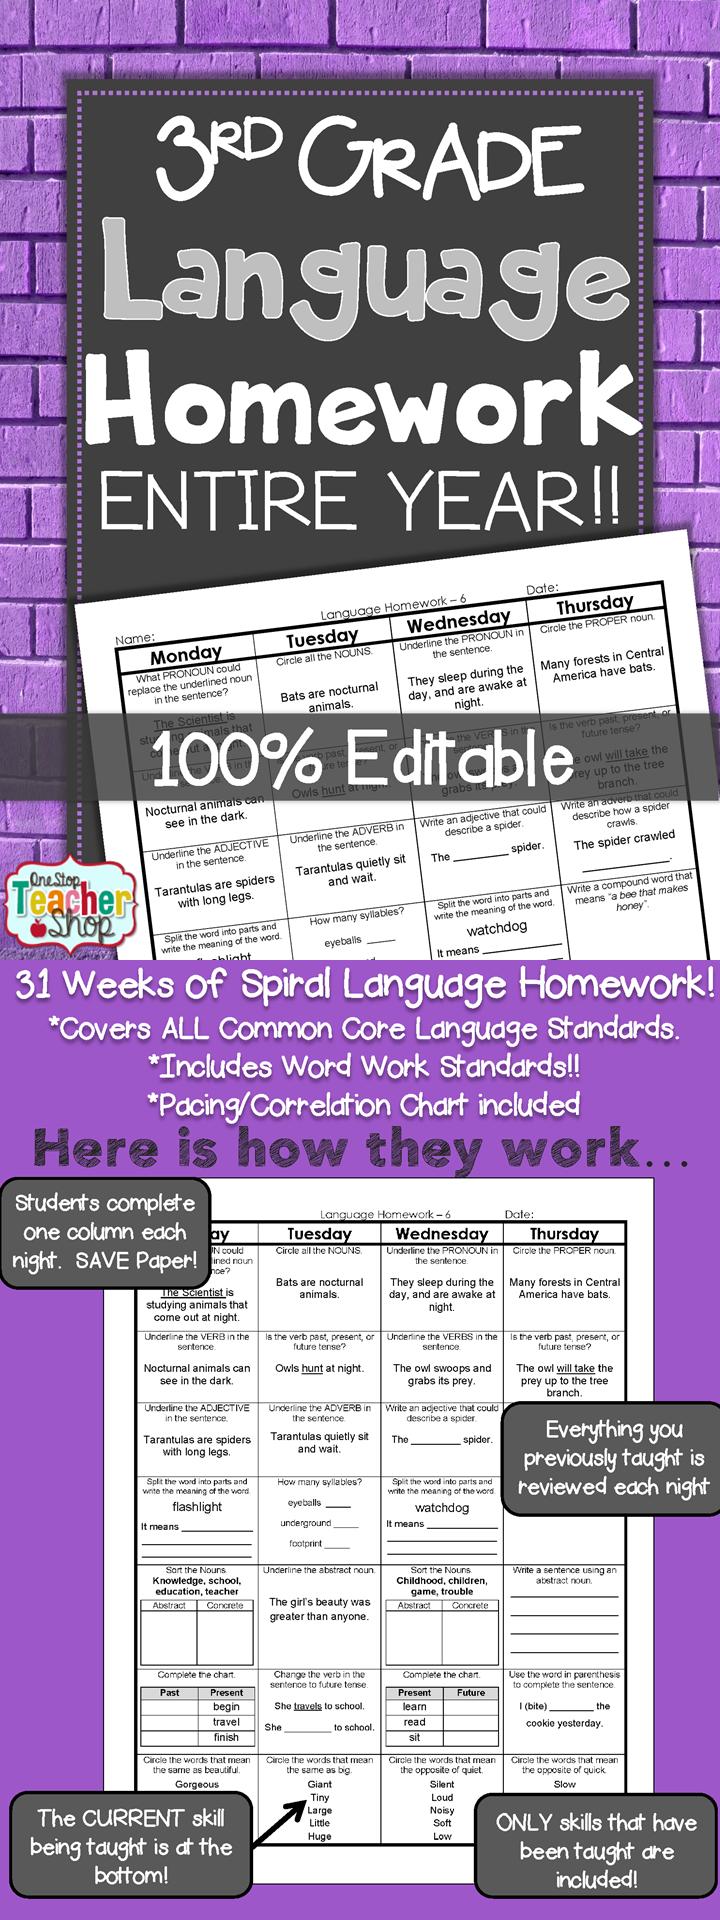 Homework help for third grade